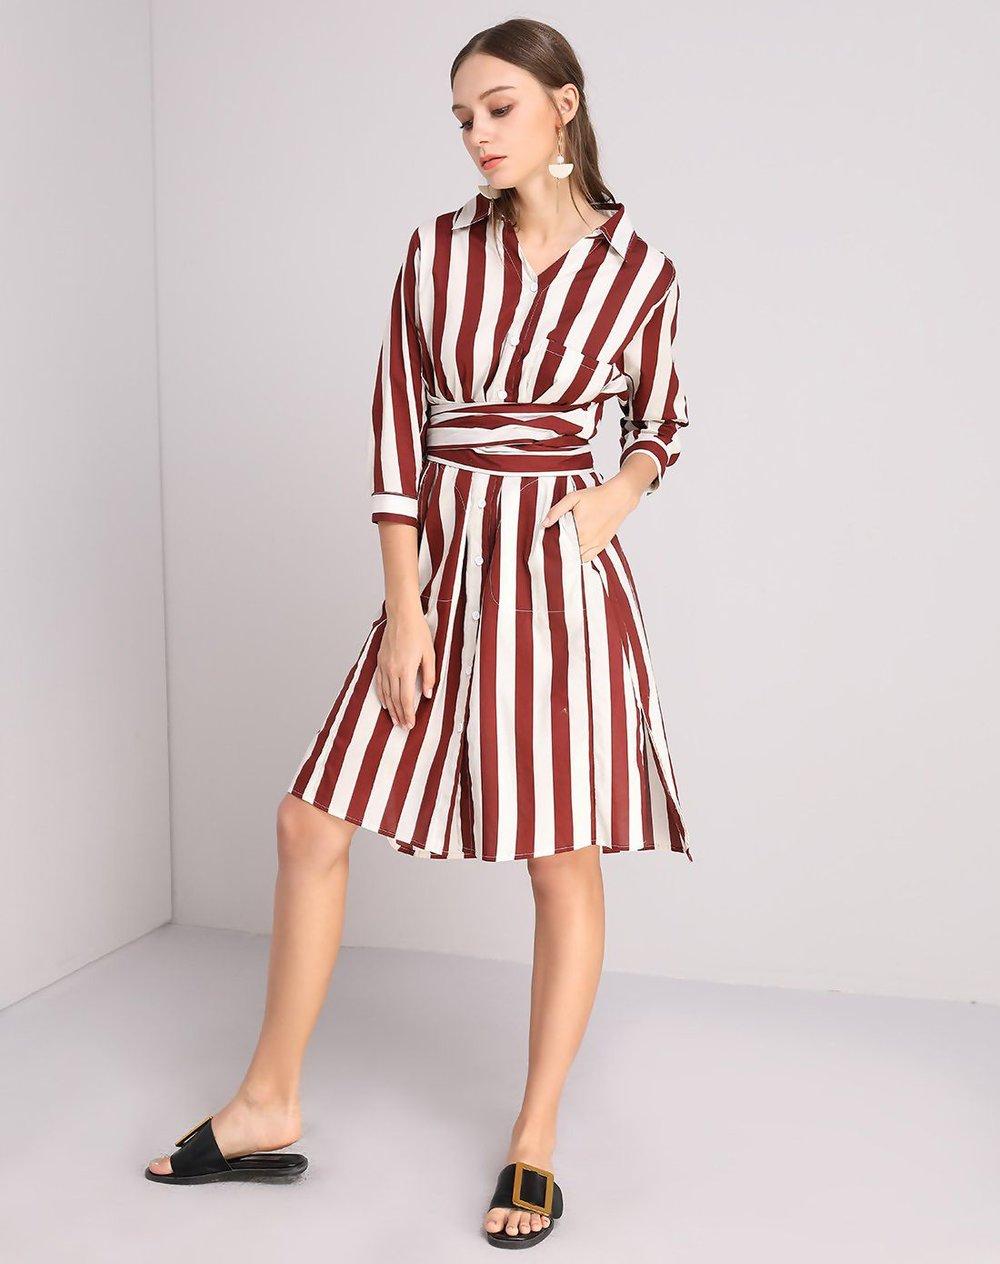 VIPshop shirt dress